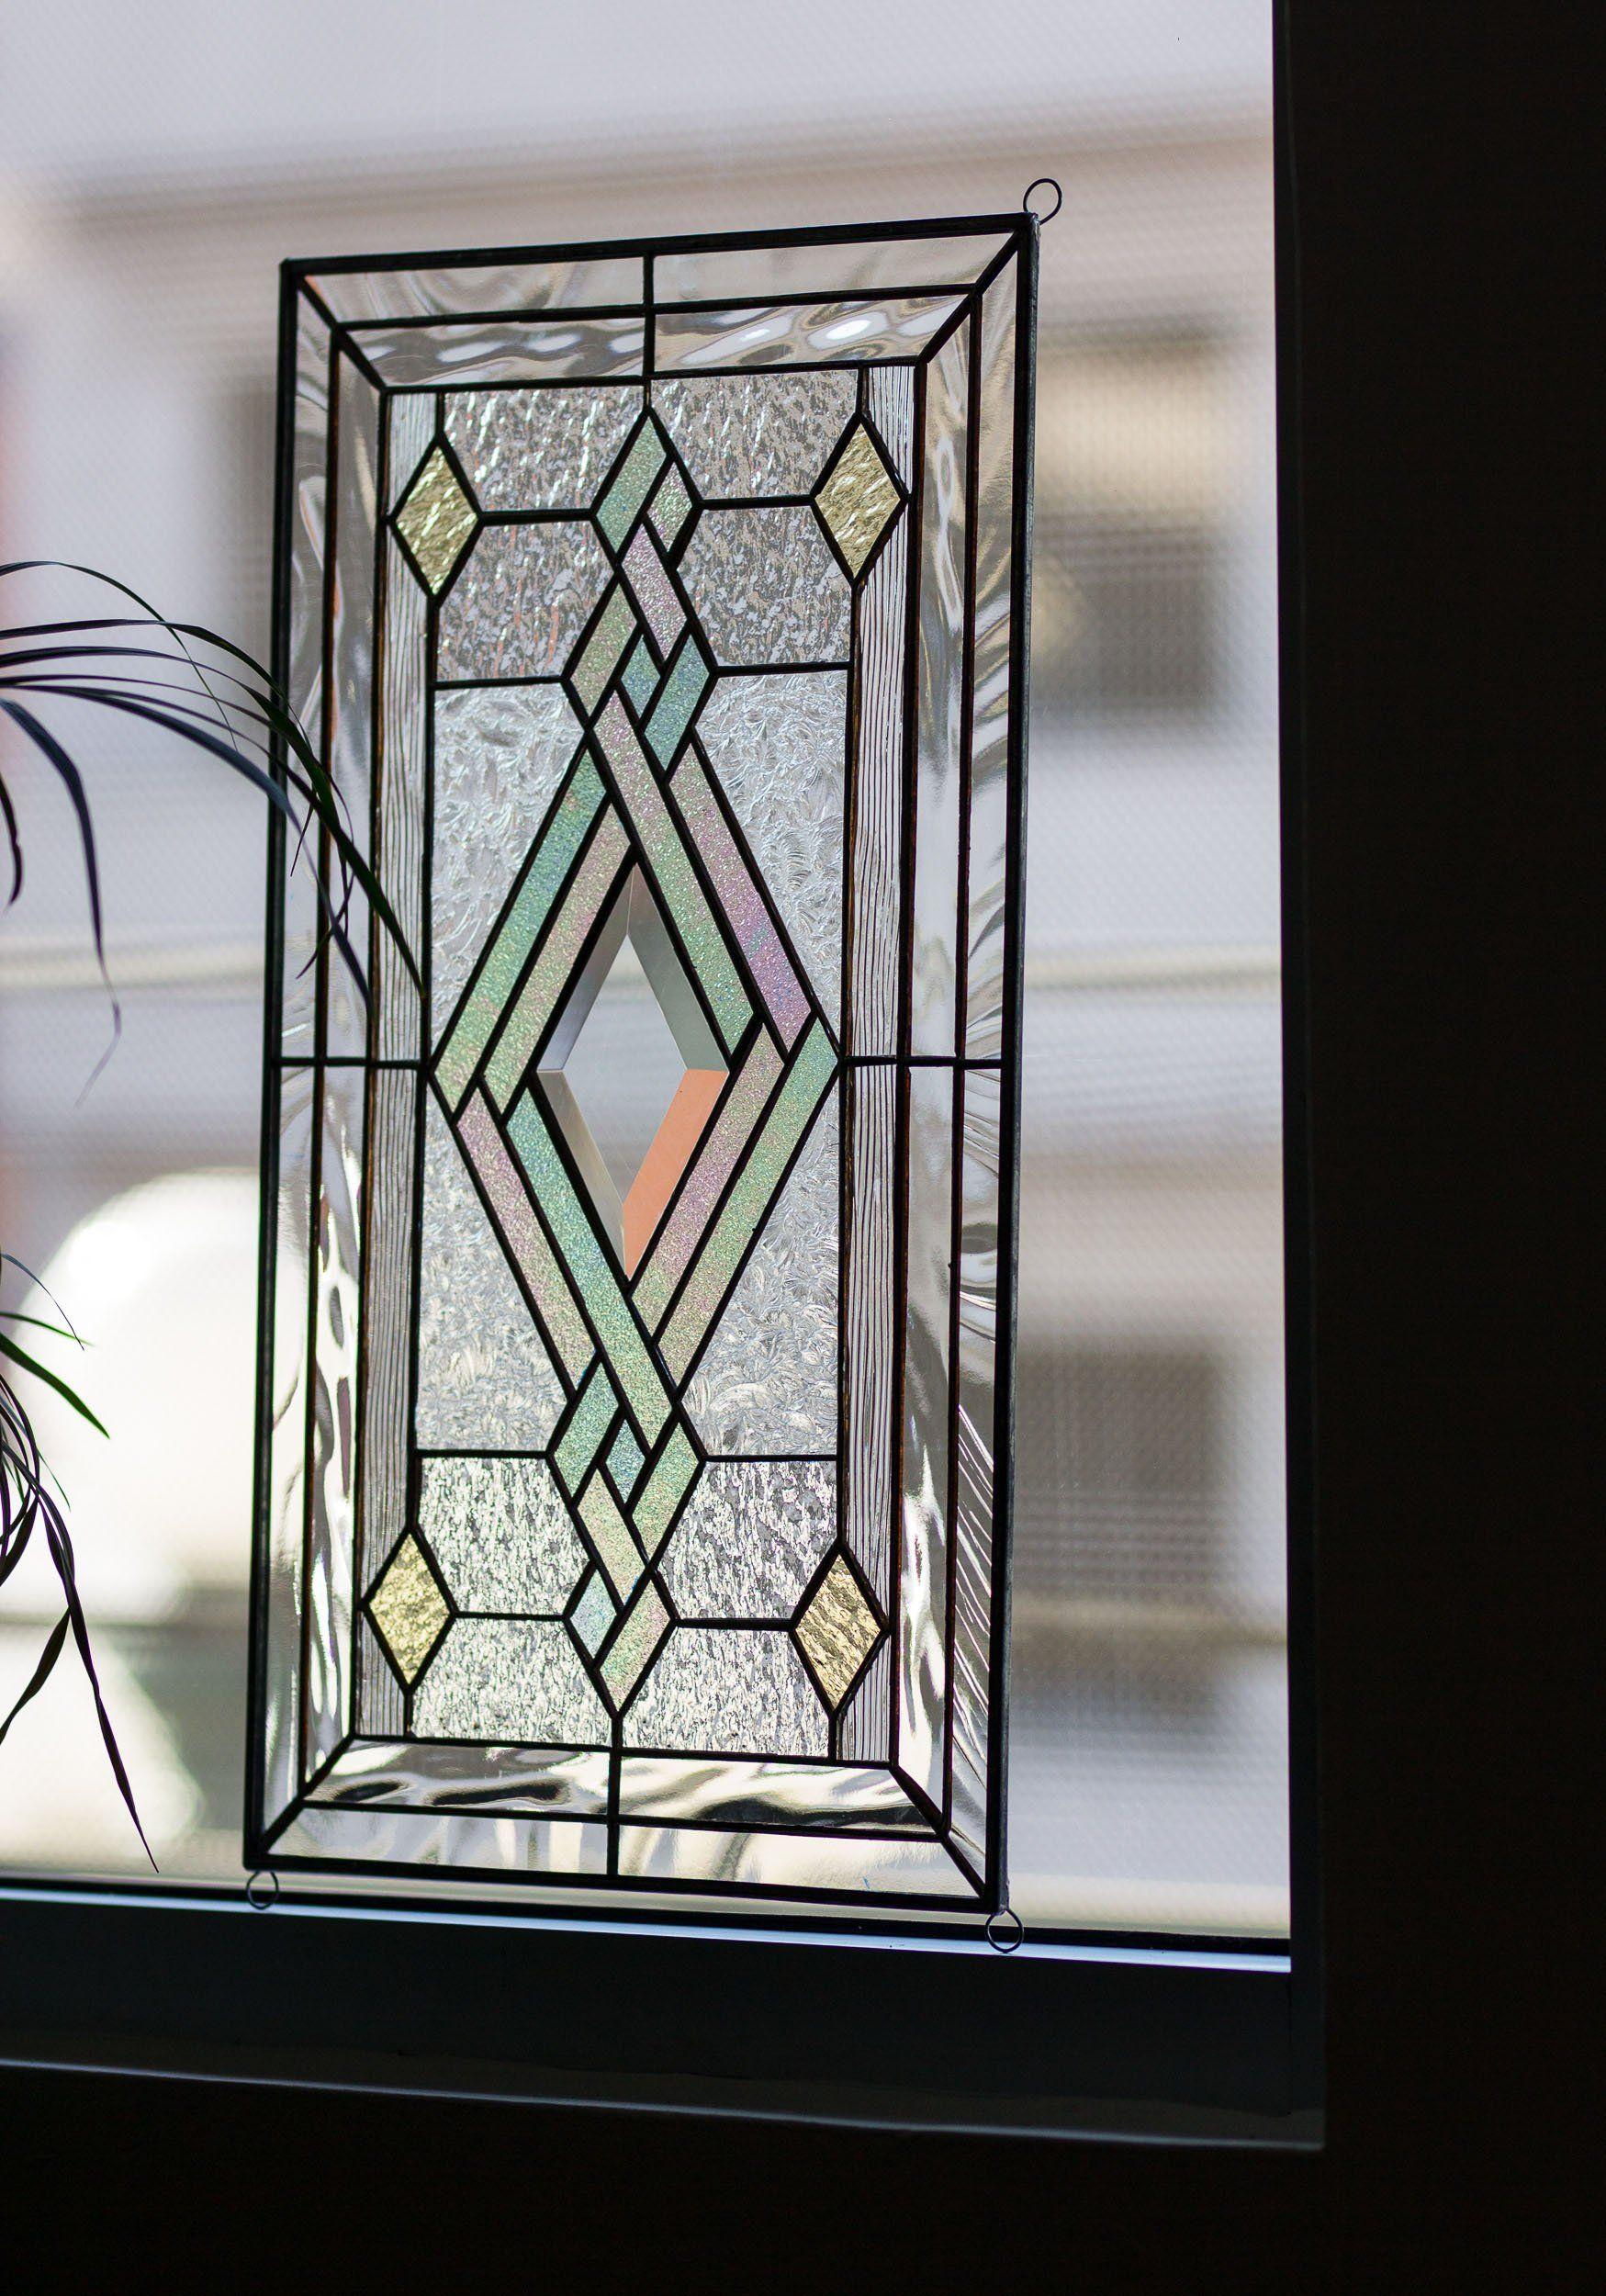 Tiffany Style Stained Glass Window Door Insert Beveled Diamond Iridiscent Swirls Elegance Stained Glass Diy Stained Glass Art Tiffany Glass Art